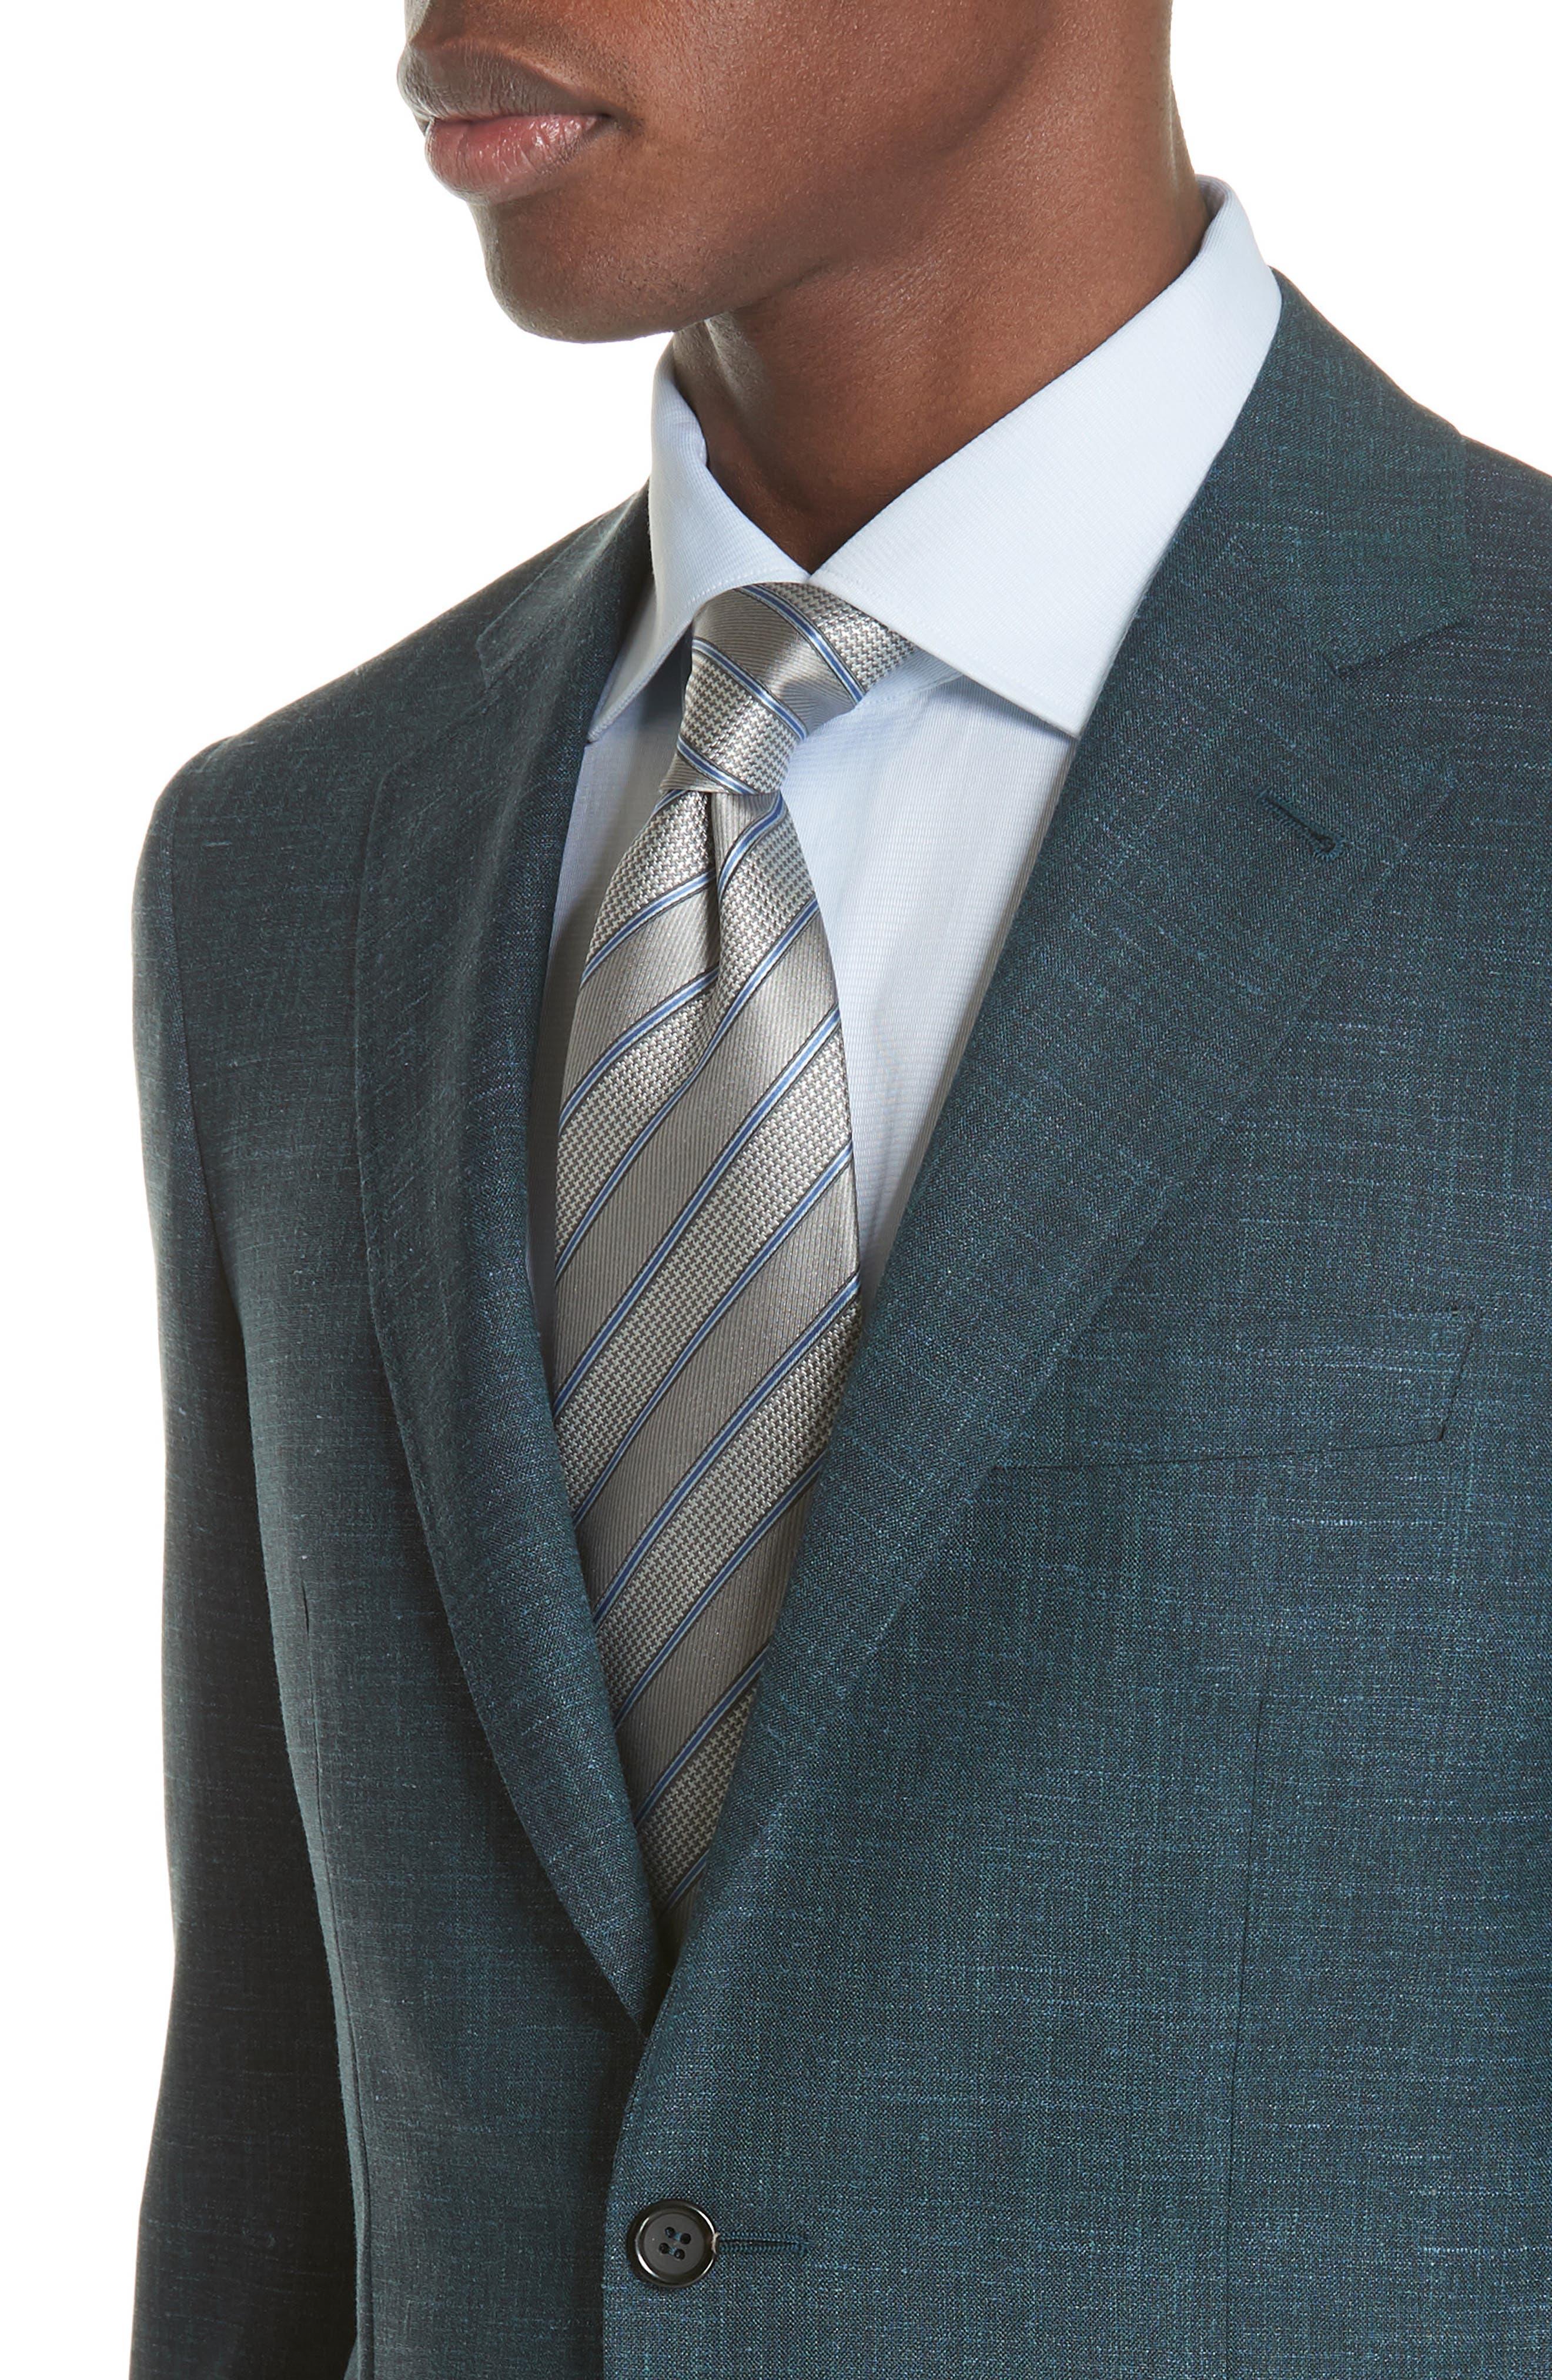 Classic Fit Wool Blend Blazer,                             Alternate thumbnail 4, color,                             Green